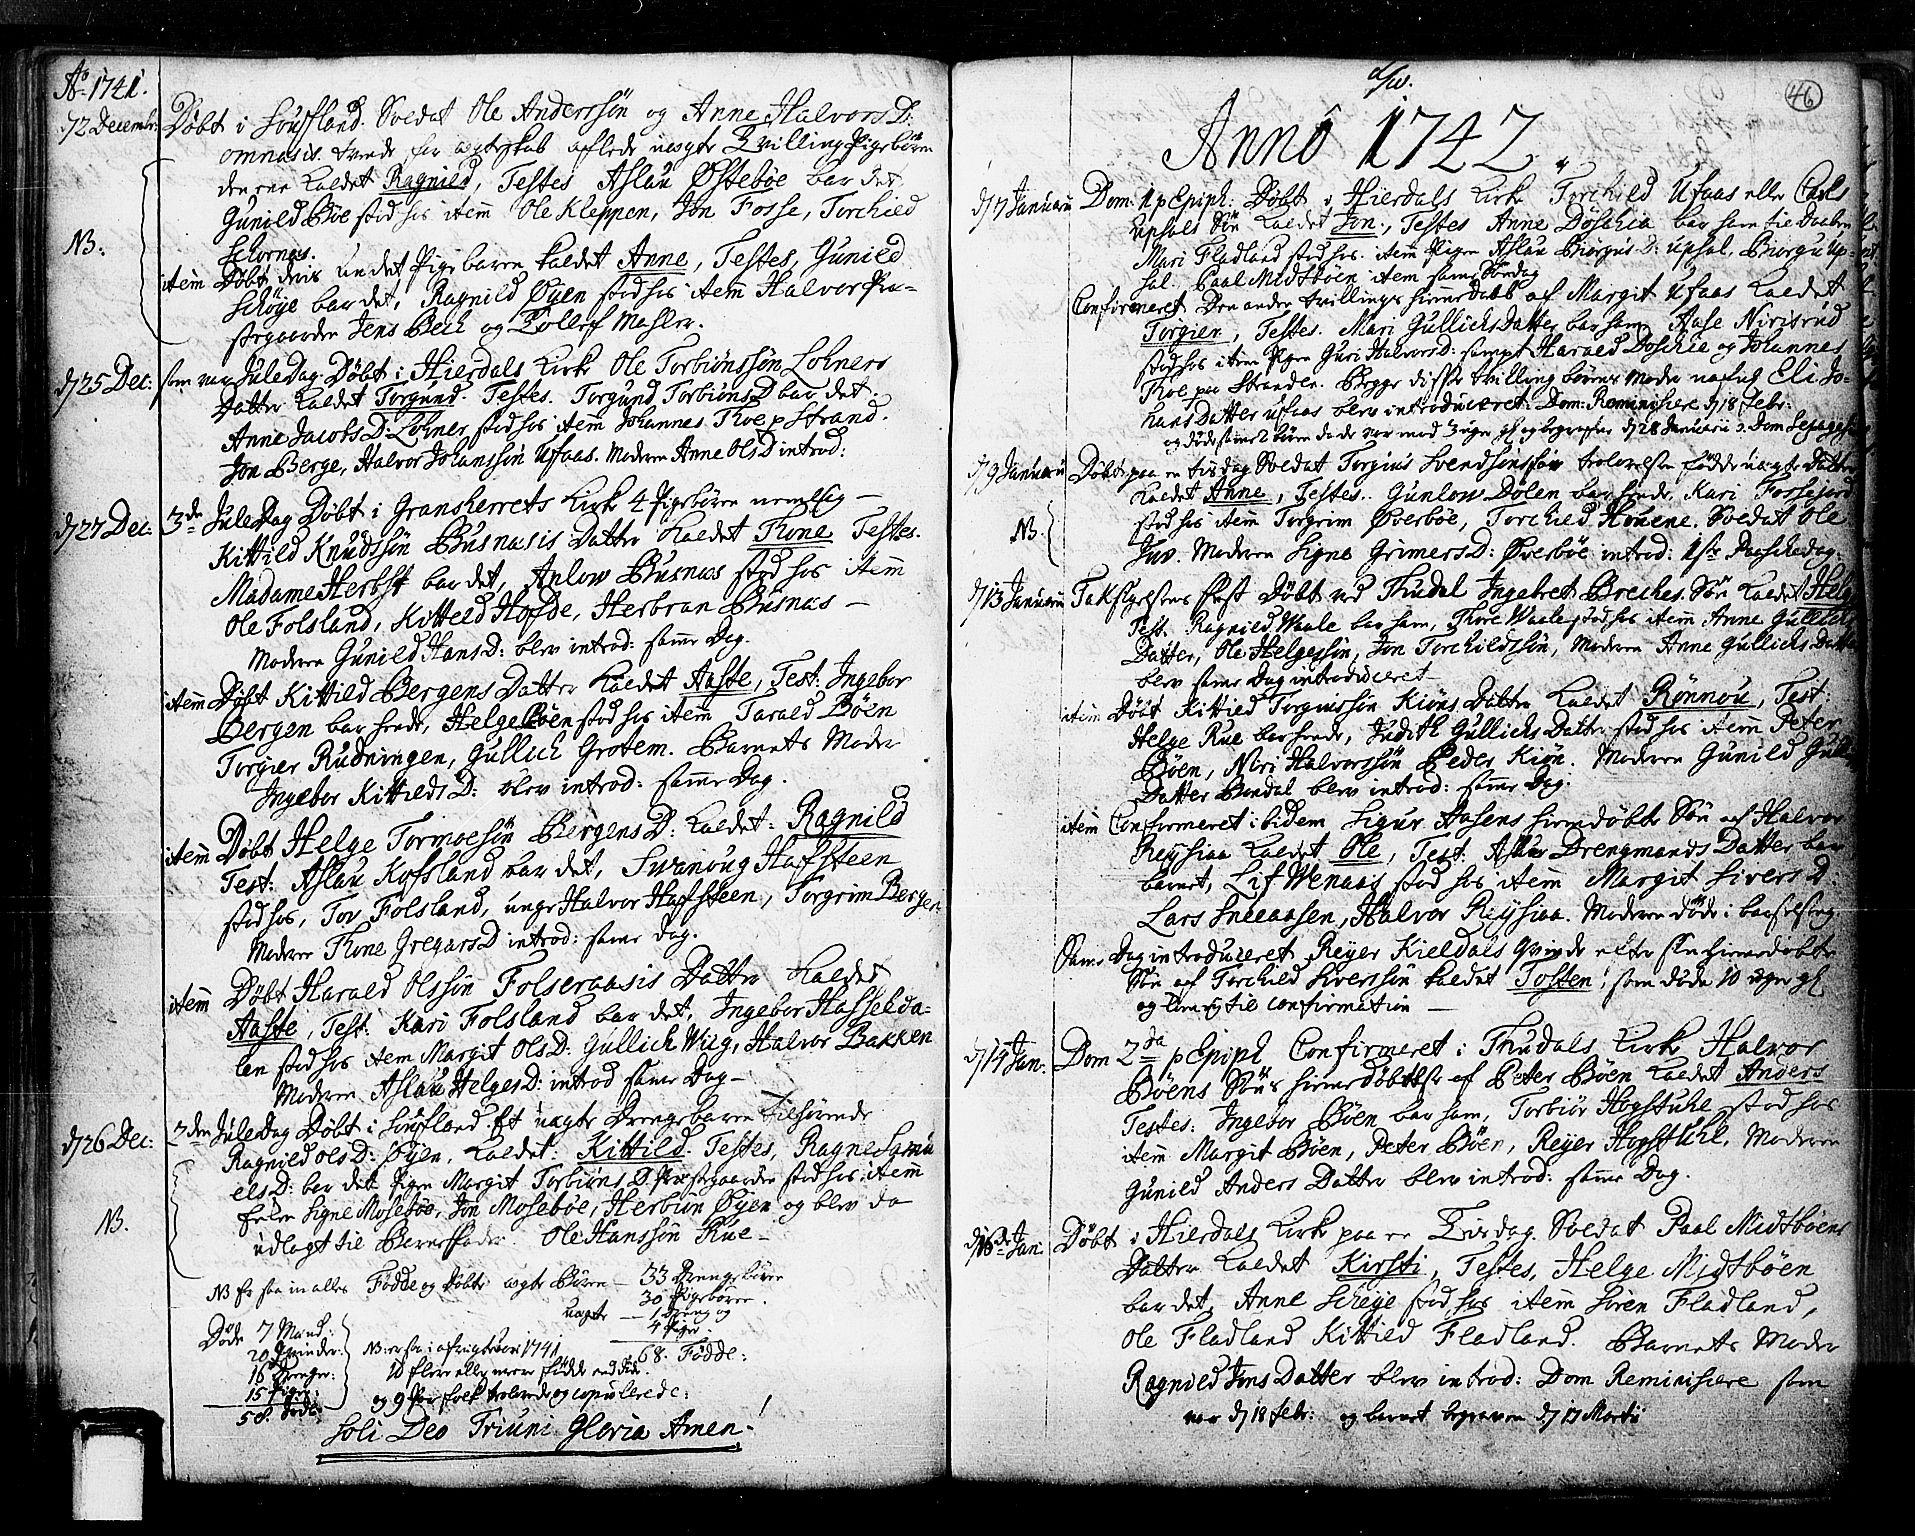 SAKO, Hjartdal kirkebøker, F/Fa/L0003: Ministerialbok nr. I 3, 1727-1775, s. 46